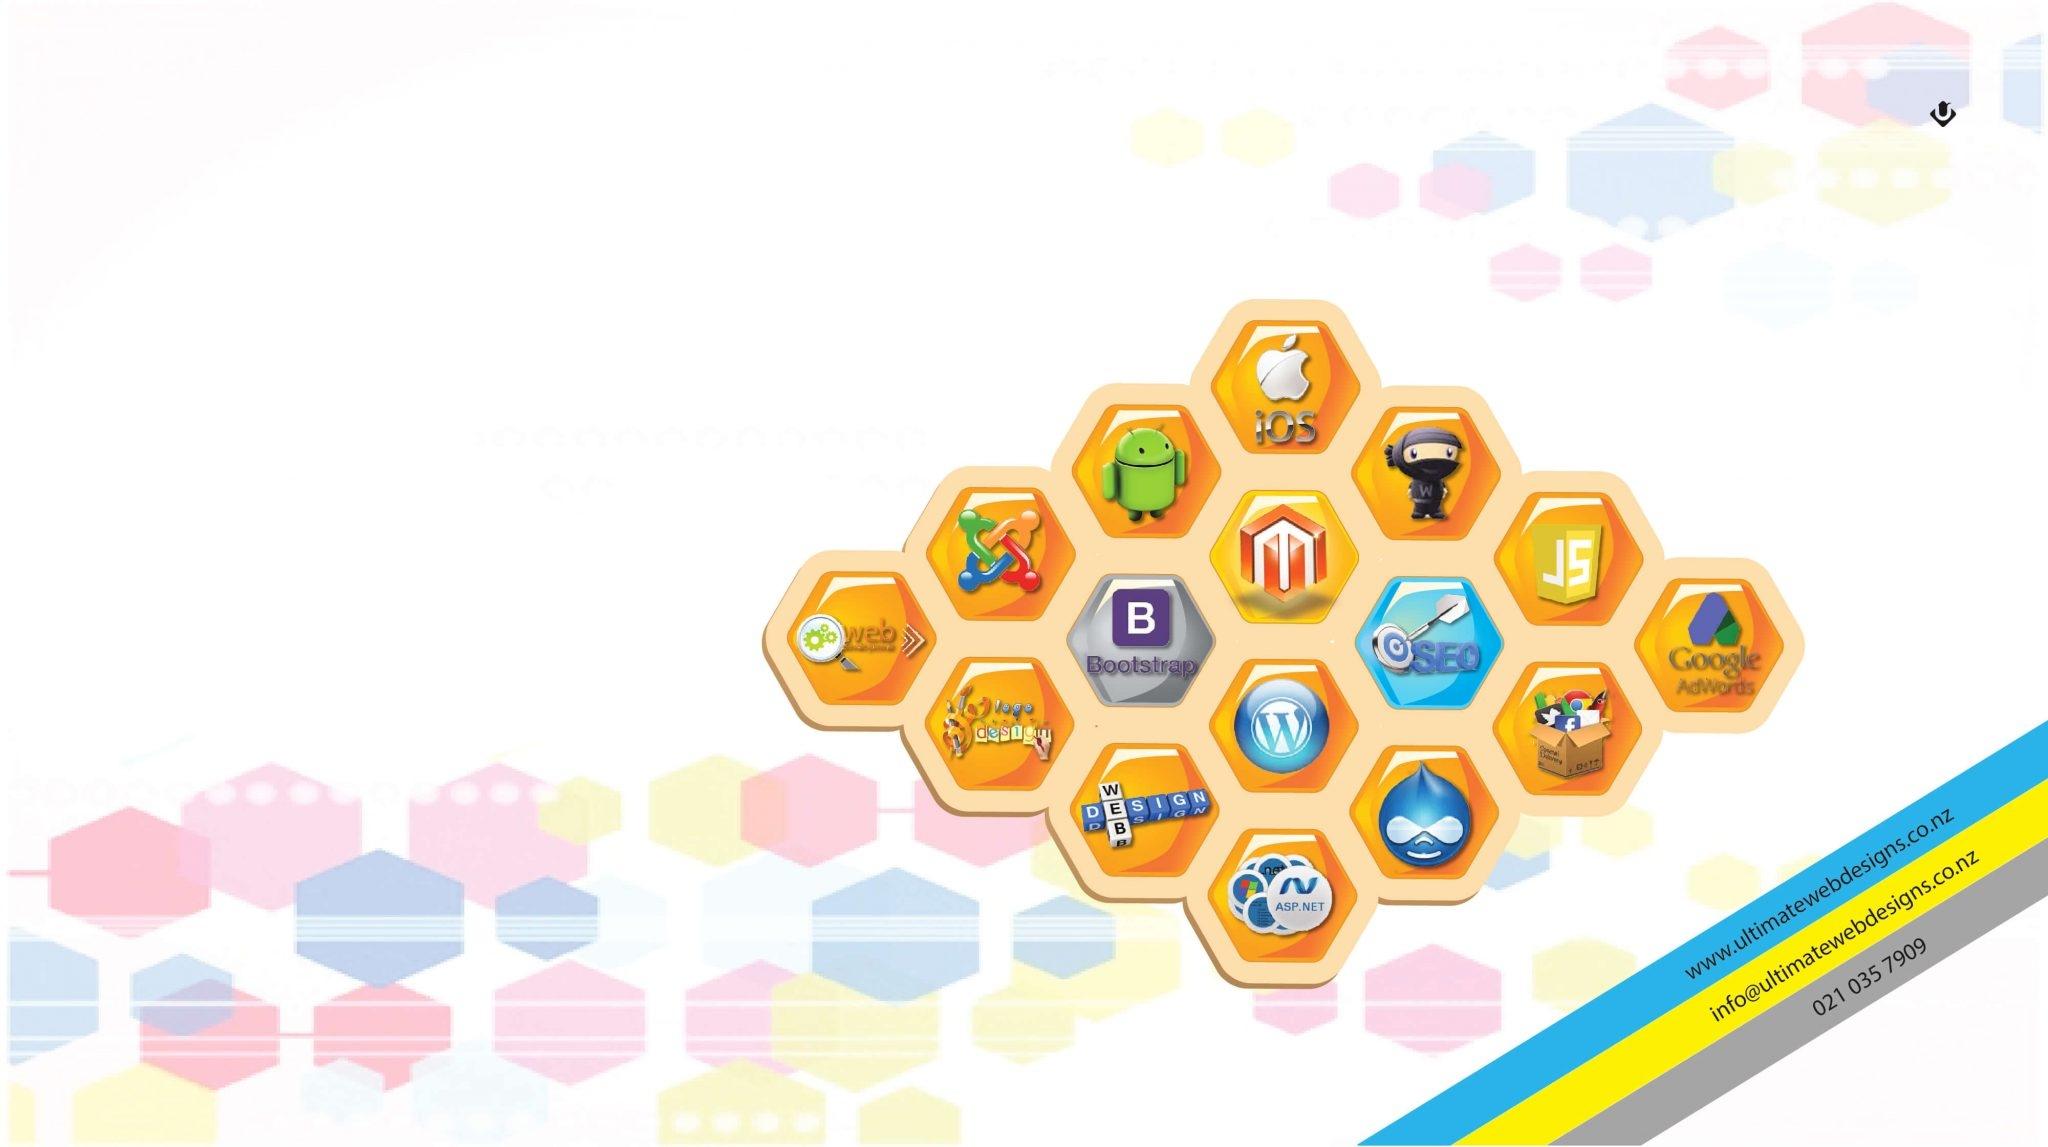 Ultimate Web Designs Limited (@ultimatewebdesign) Cover Image